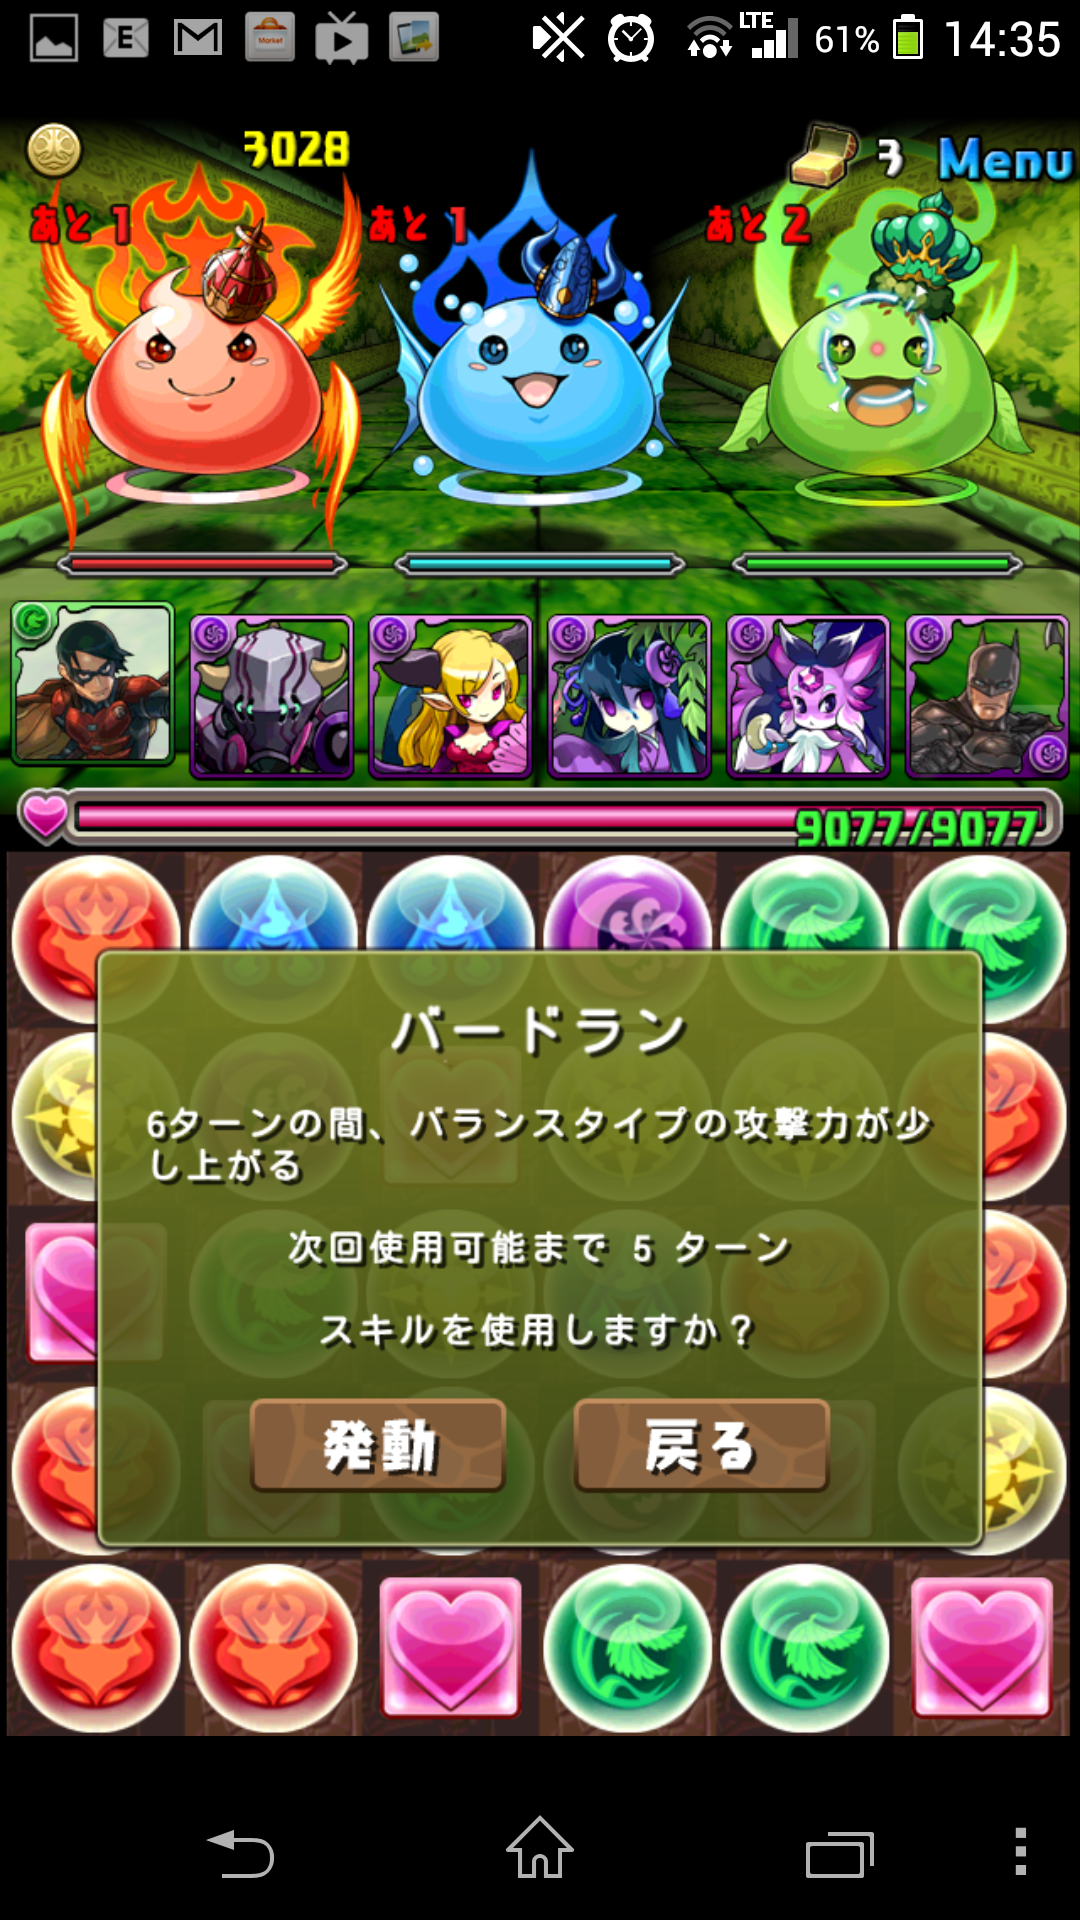 Screenshot_2014-04-01-14-35-20.png